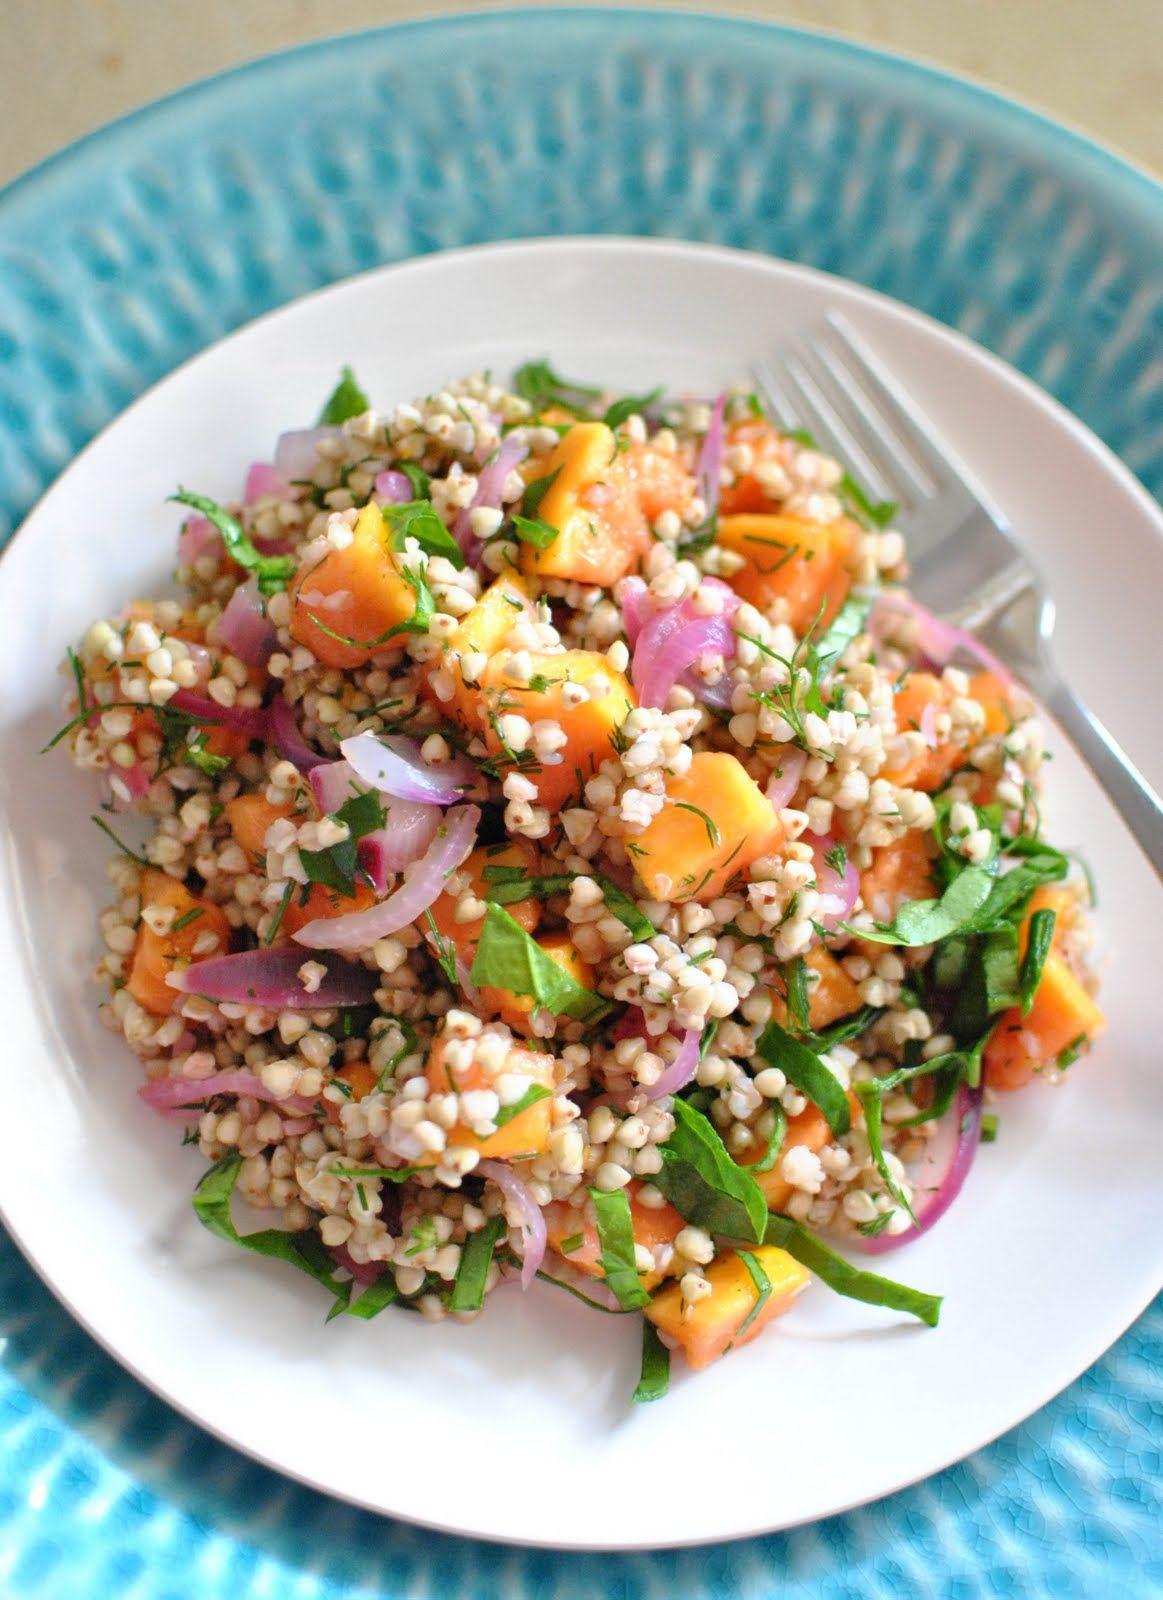 Scandi Foodie: Rich Mineral Salad a.k.a. Super Healthy Salad